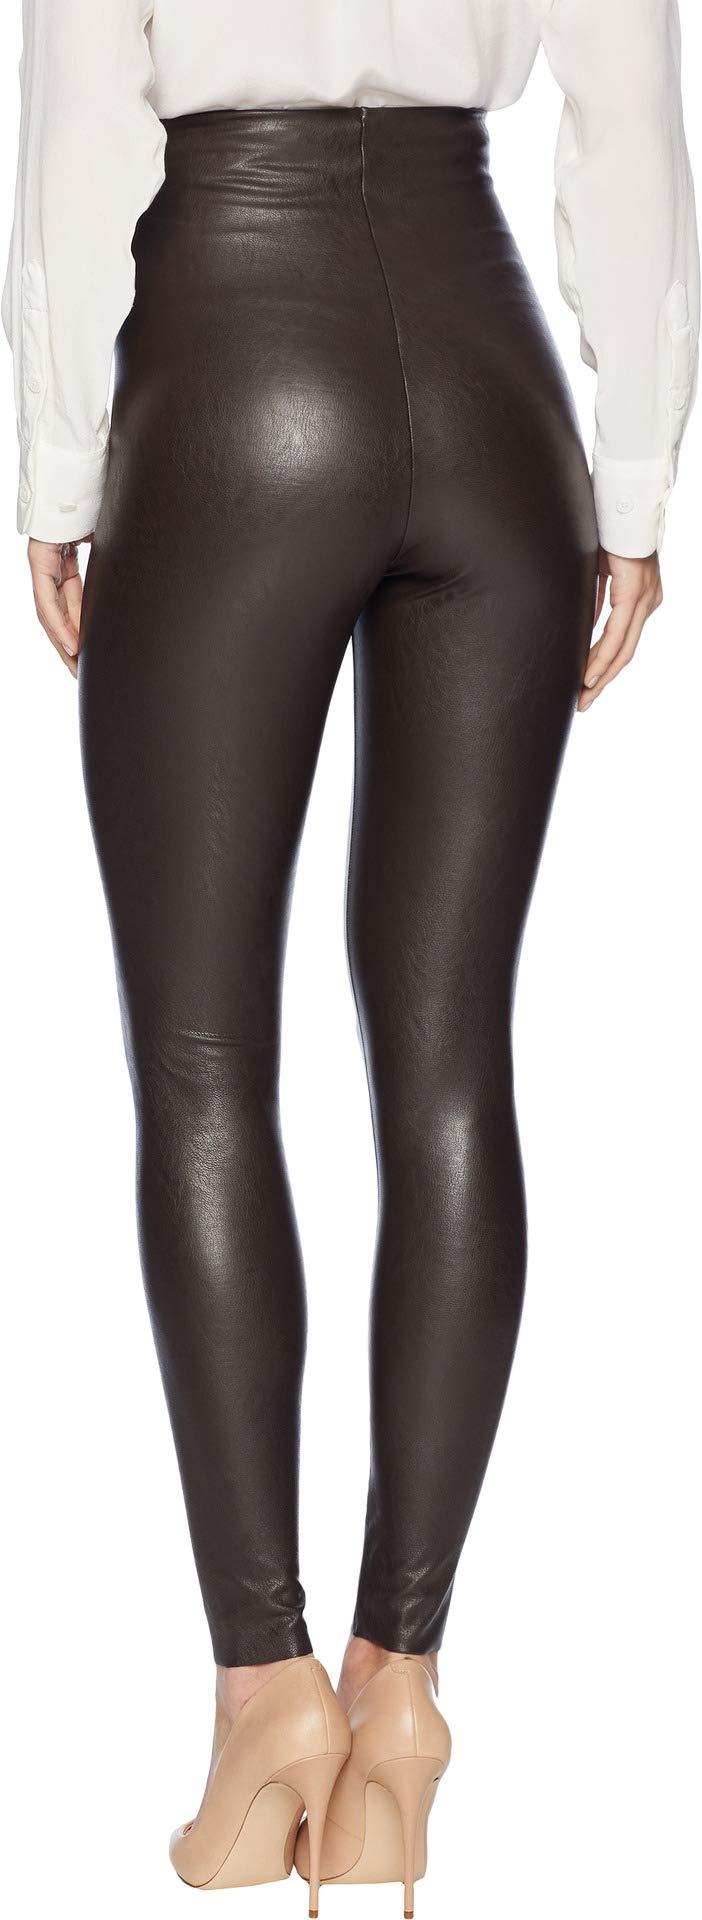 commando Women's Perfect Control Faux Leather Leggings SLG06 Espresso Large by commando (Image #3)